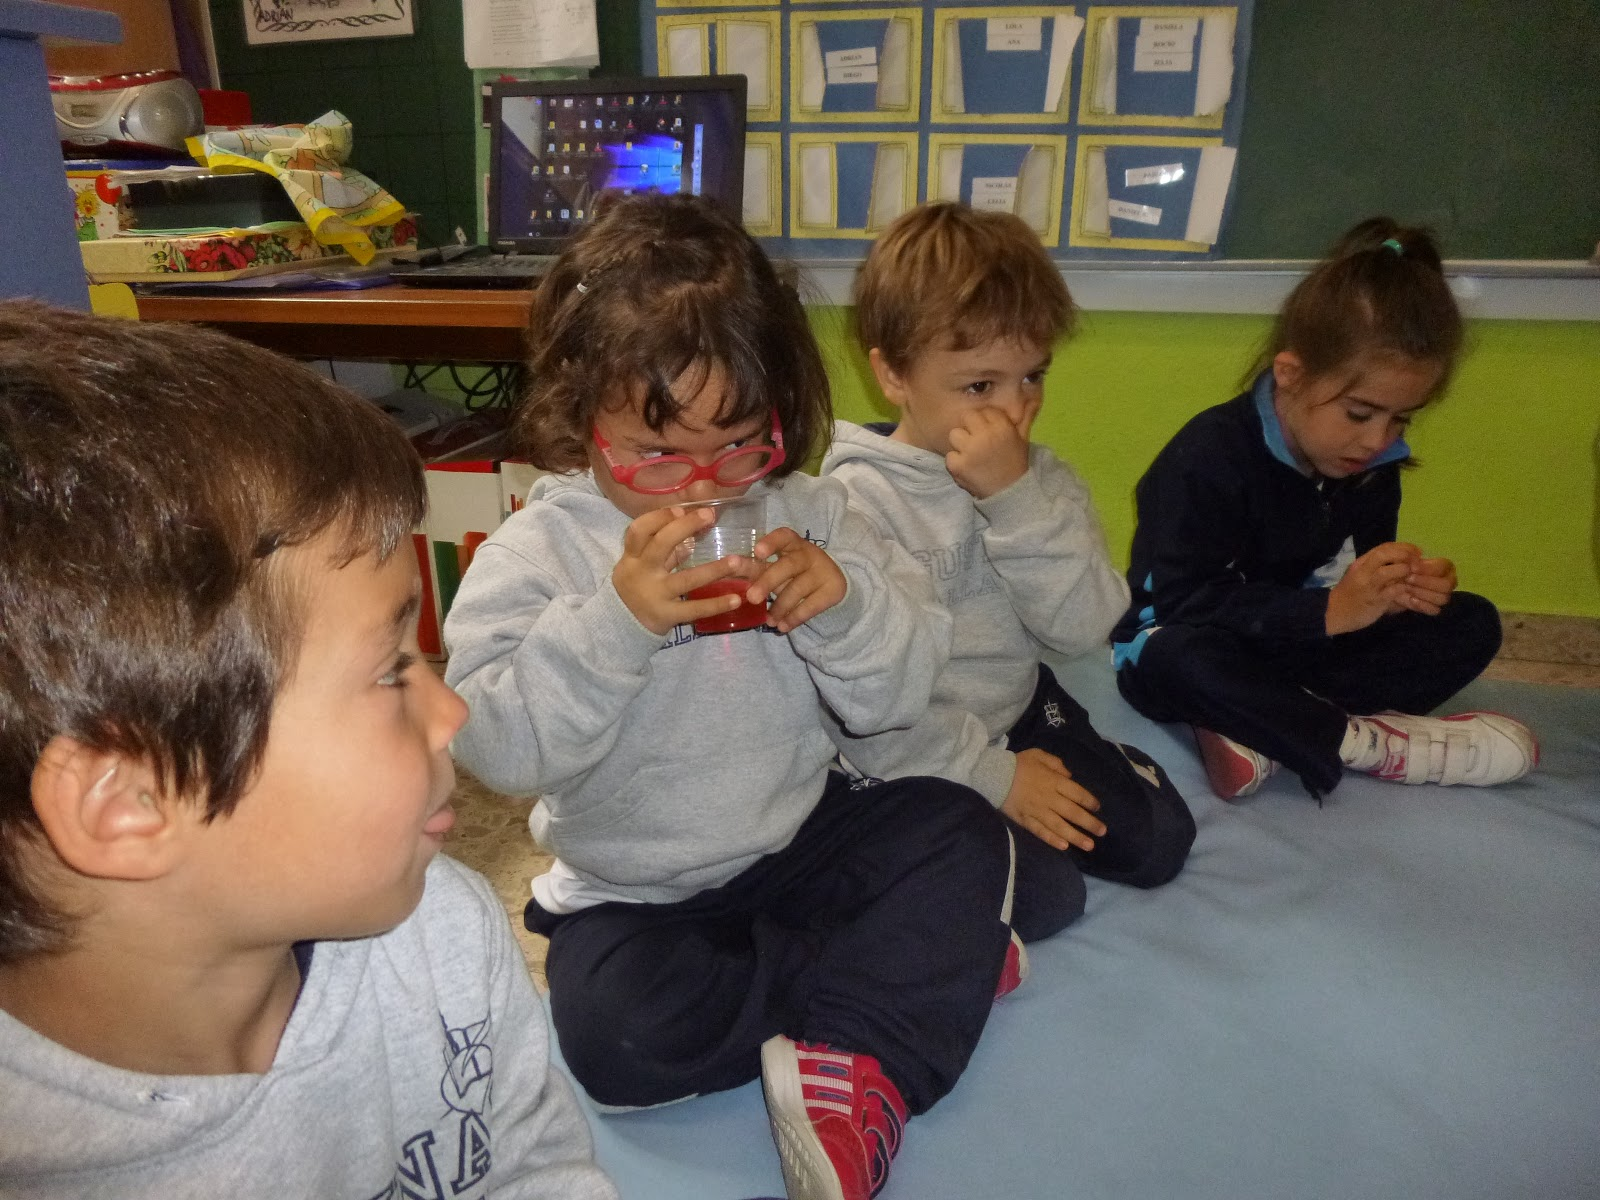 Agustinas Valladolid - 2017 - Infantil 4 - Taller Consumo 1